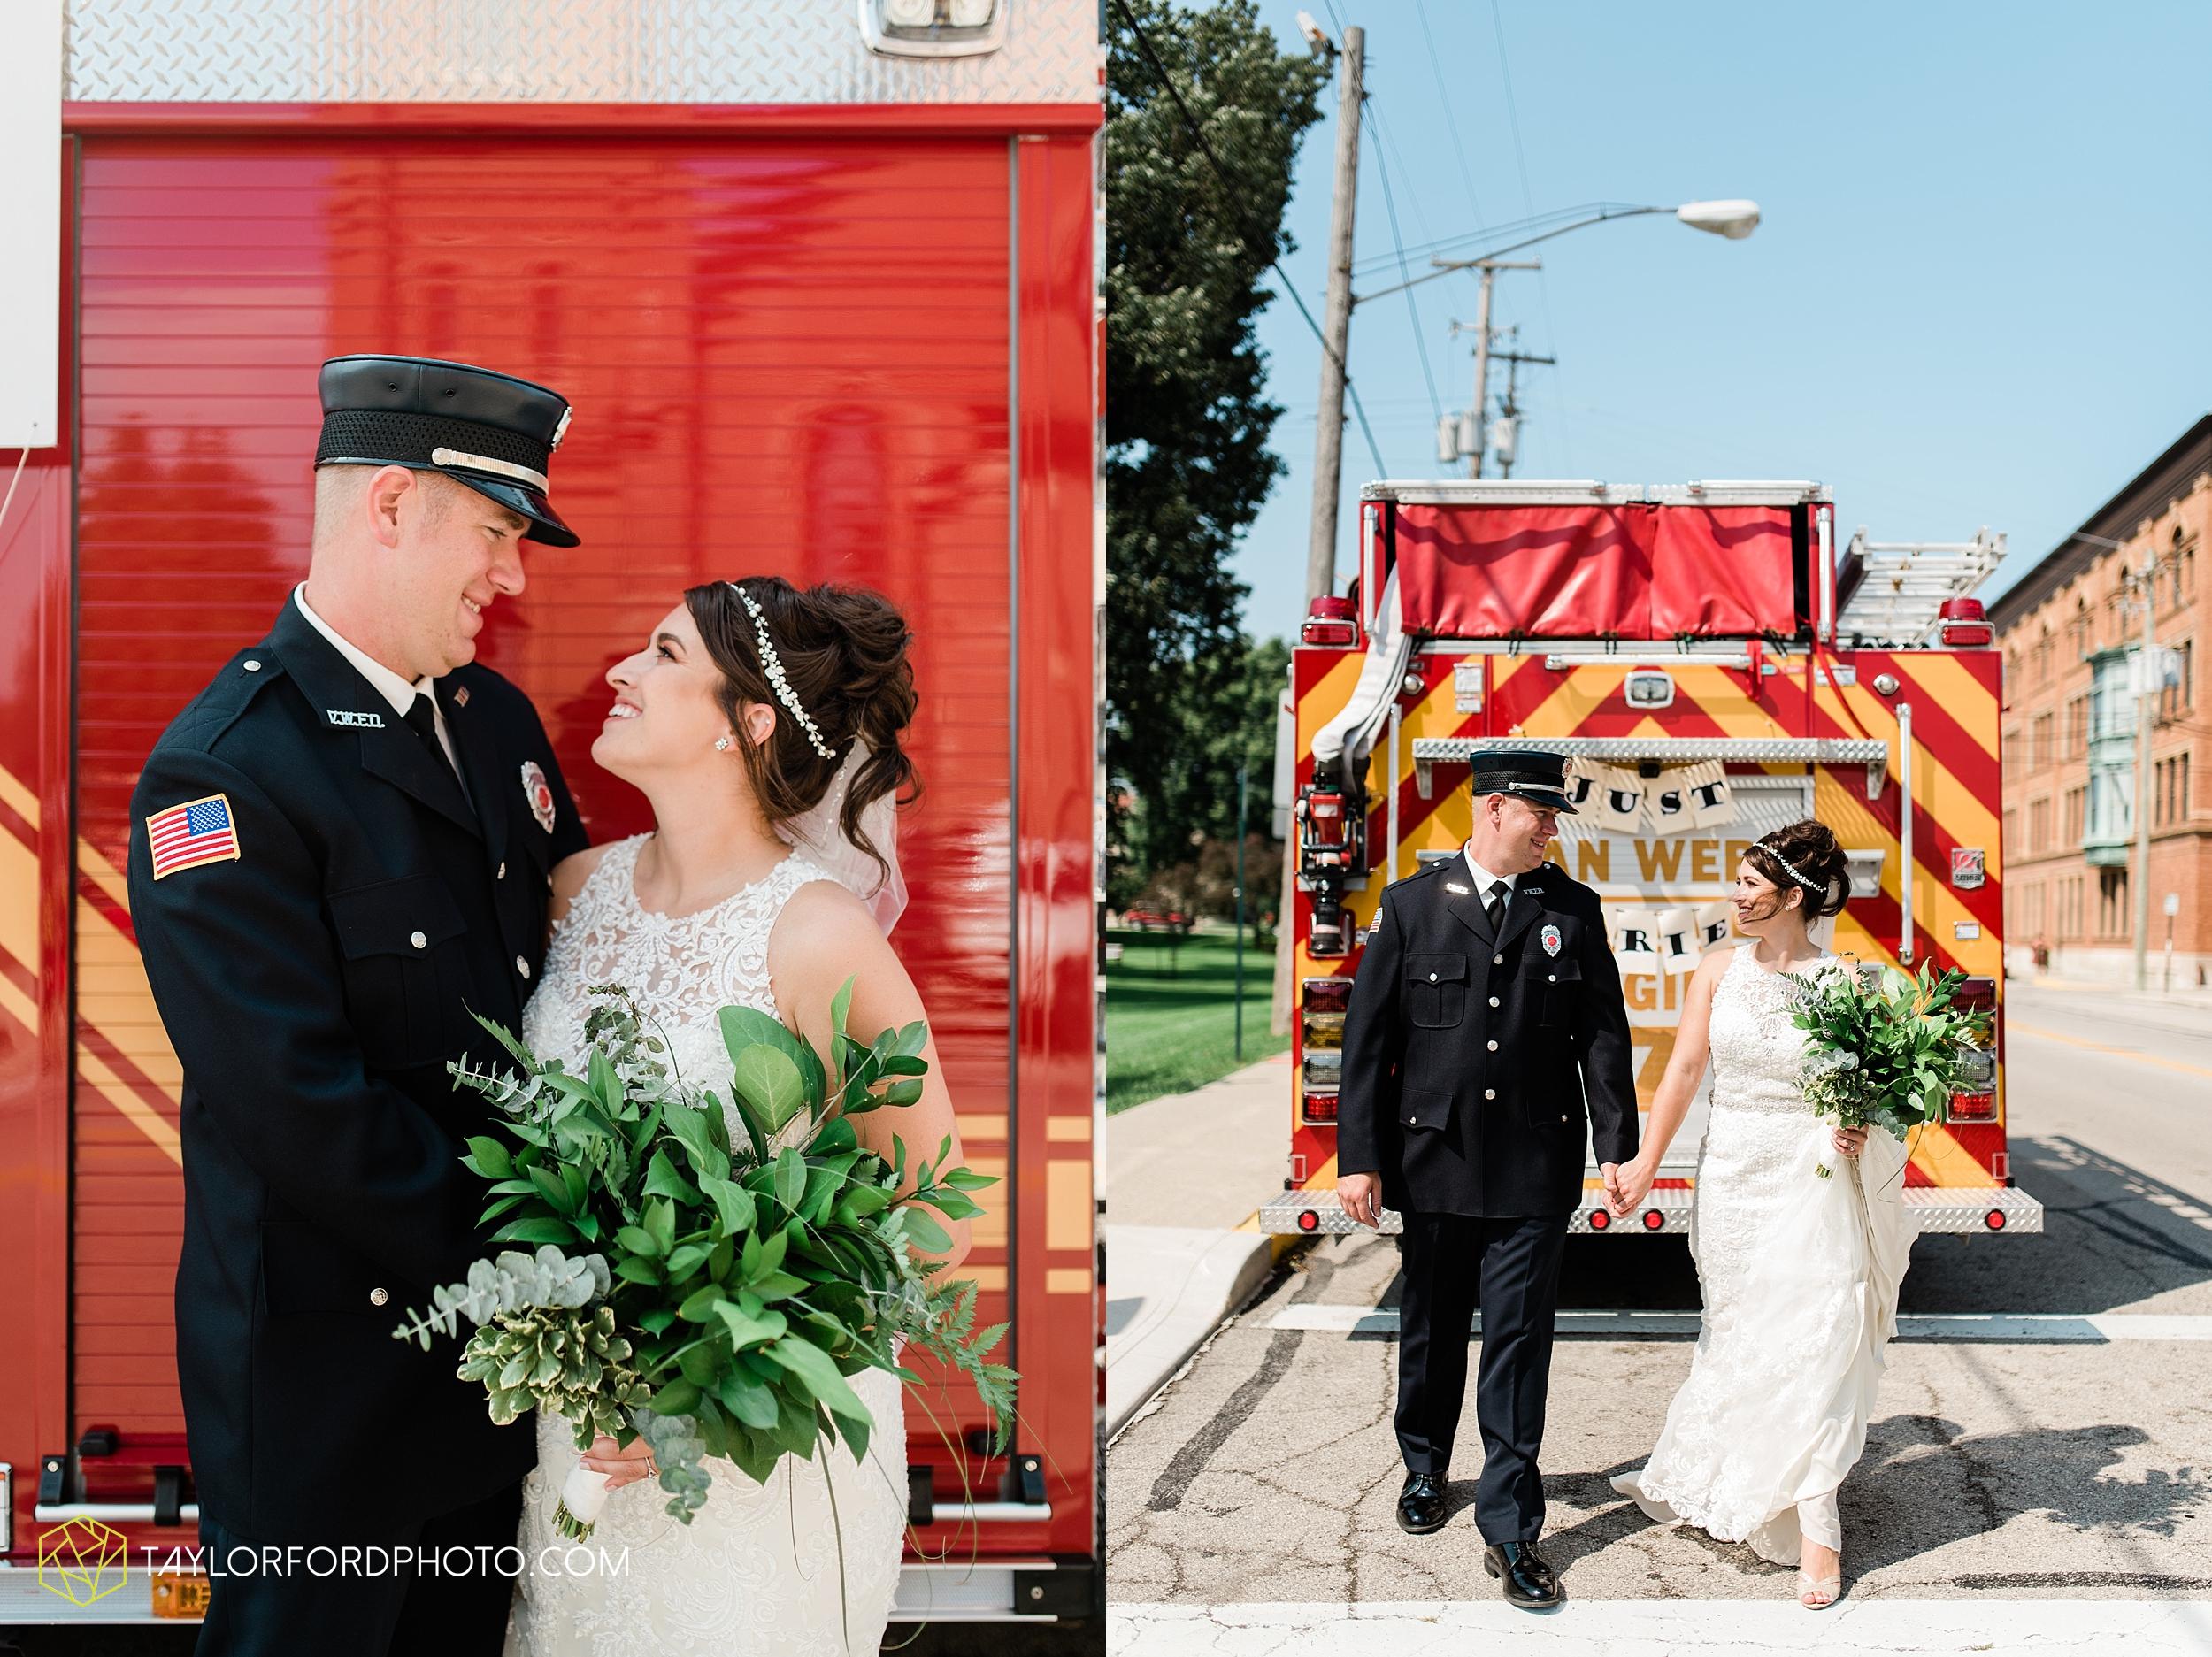 van-wert-ohio-first-united-methodist-church-county-dairy-barn-wedding-photographer-taylor-ford-photography_9843.jpg